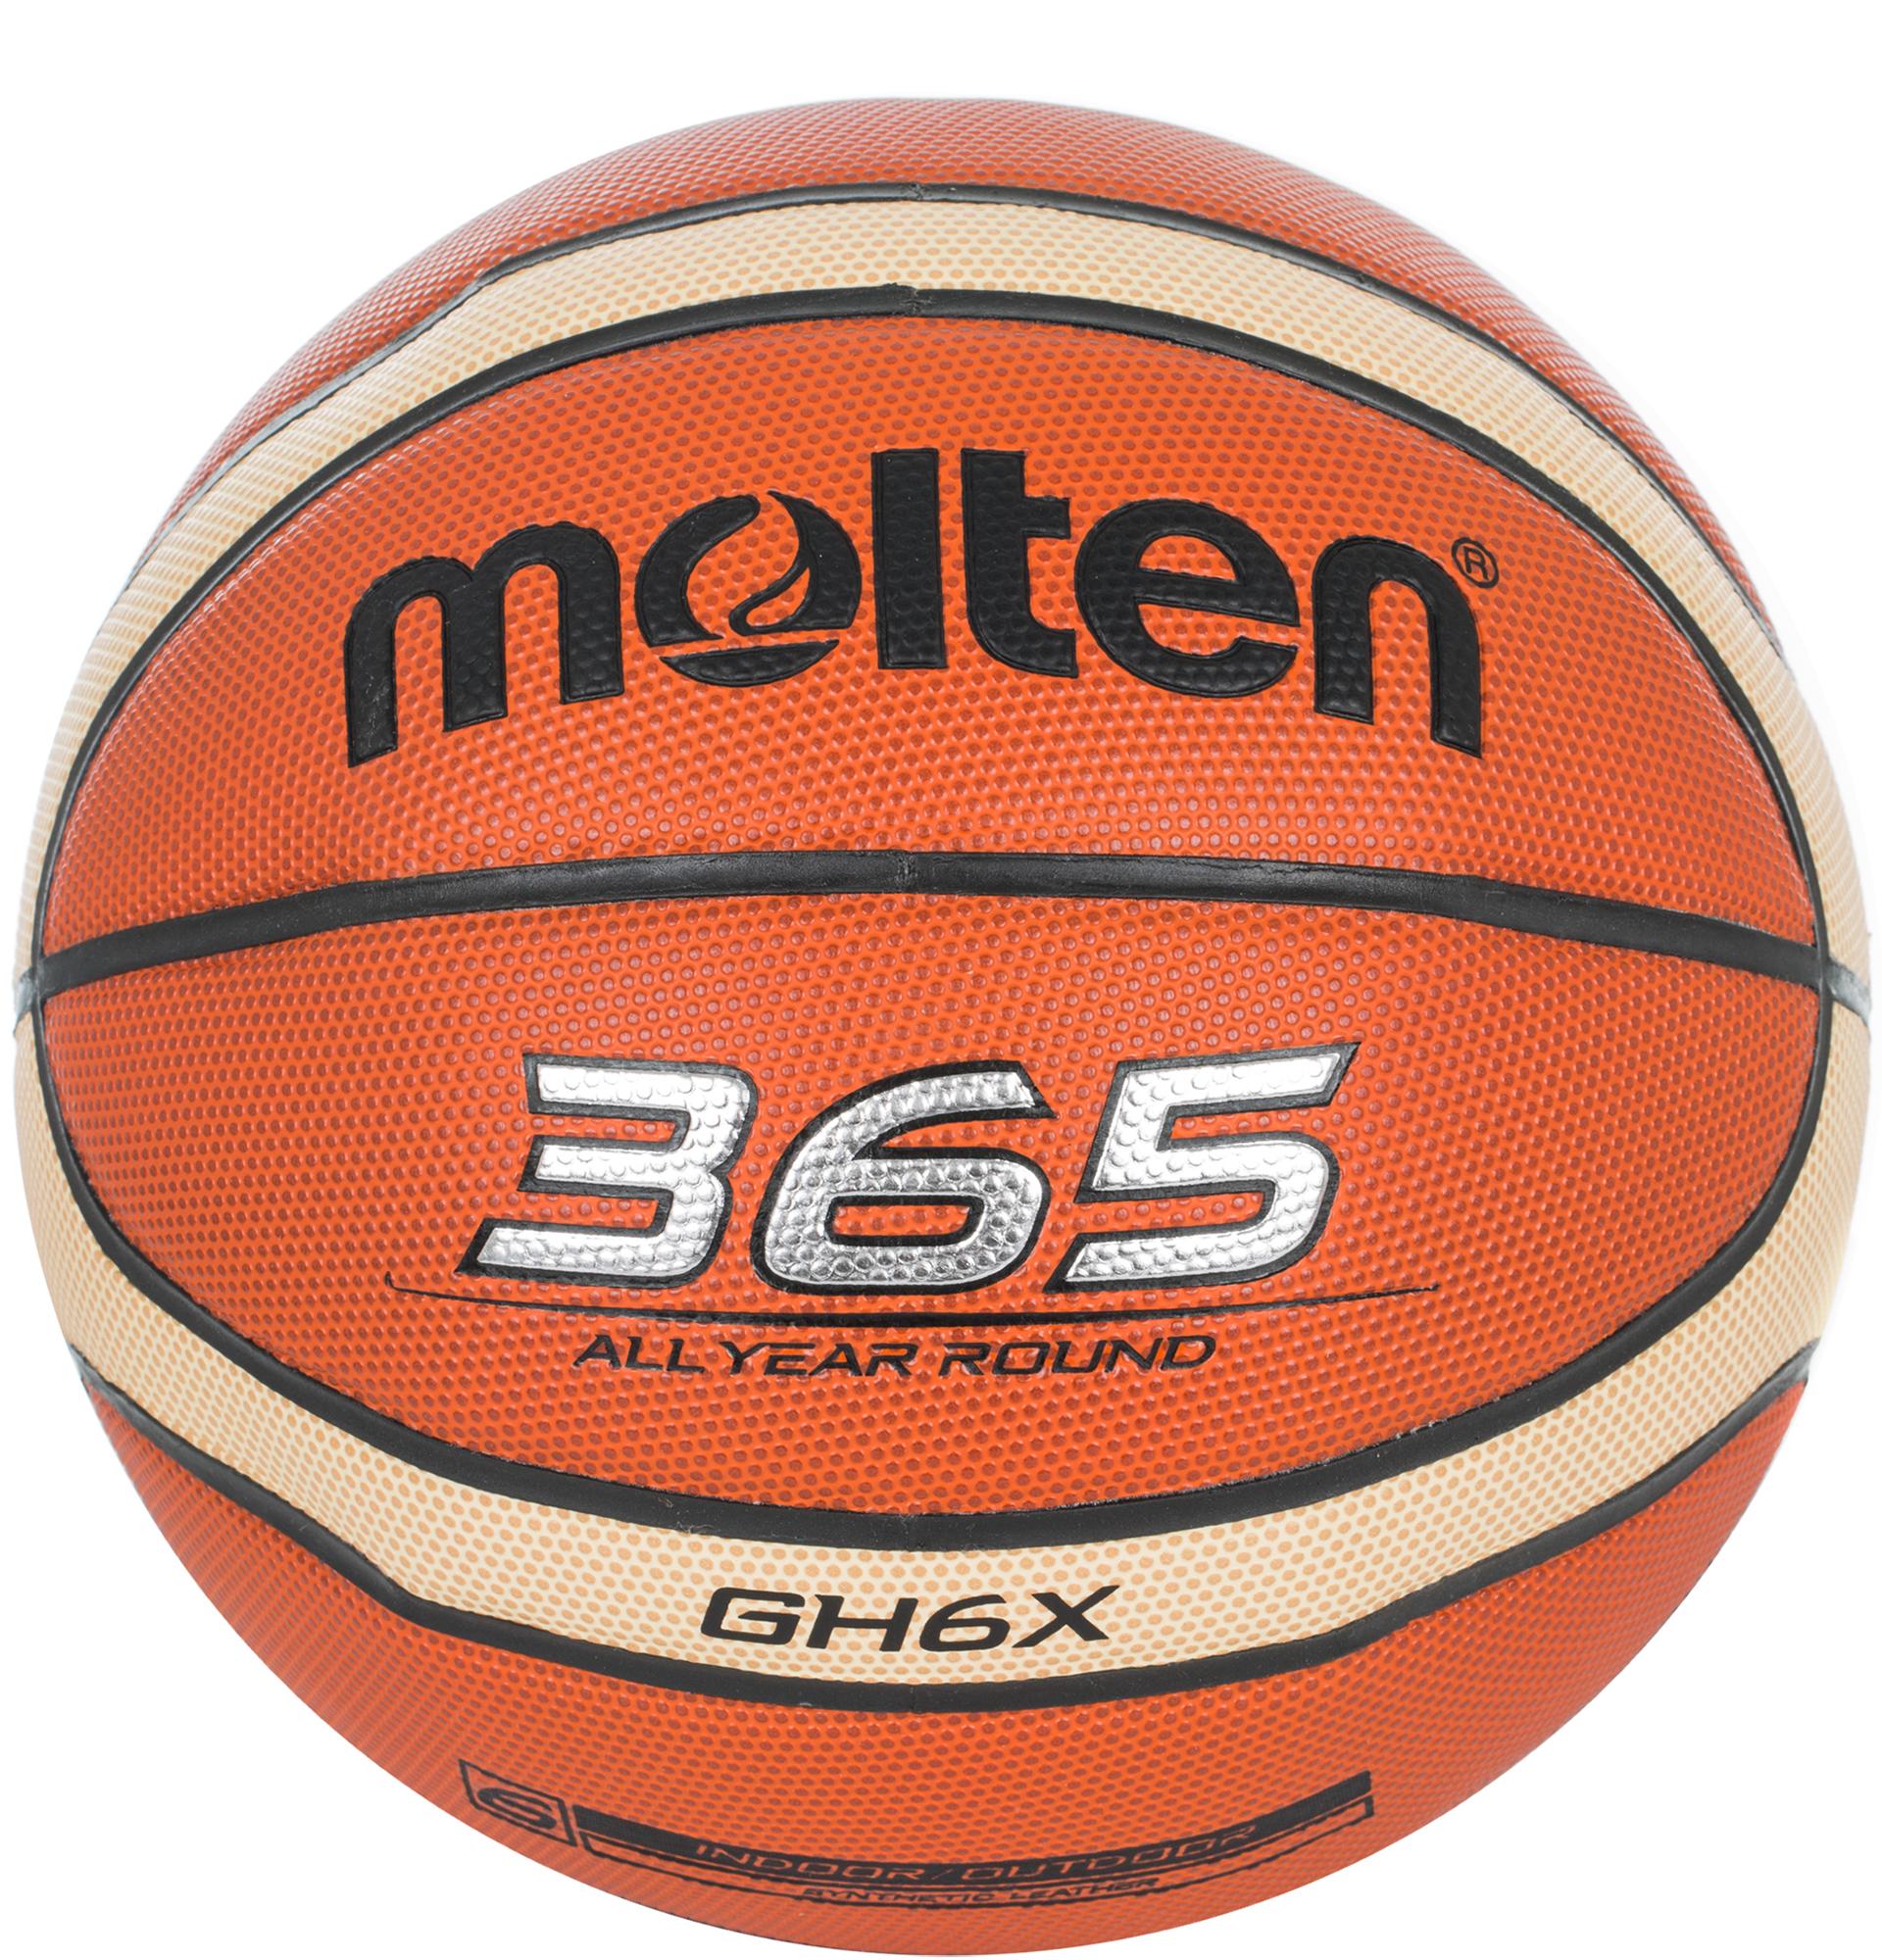 Molten Мяч баскетбольный GH6X